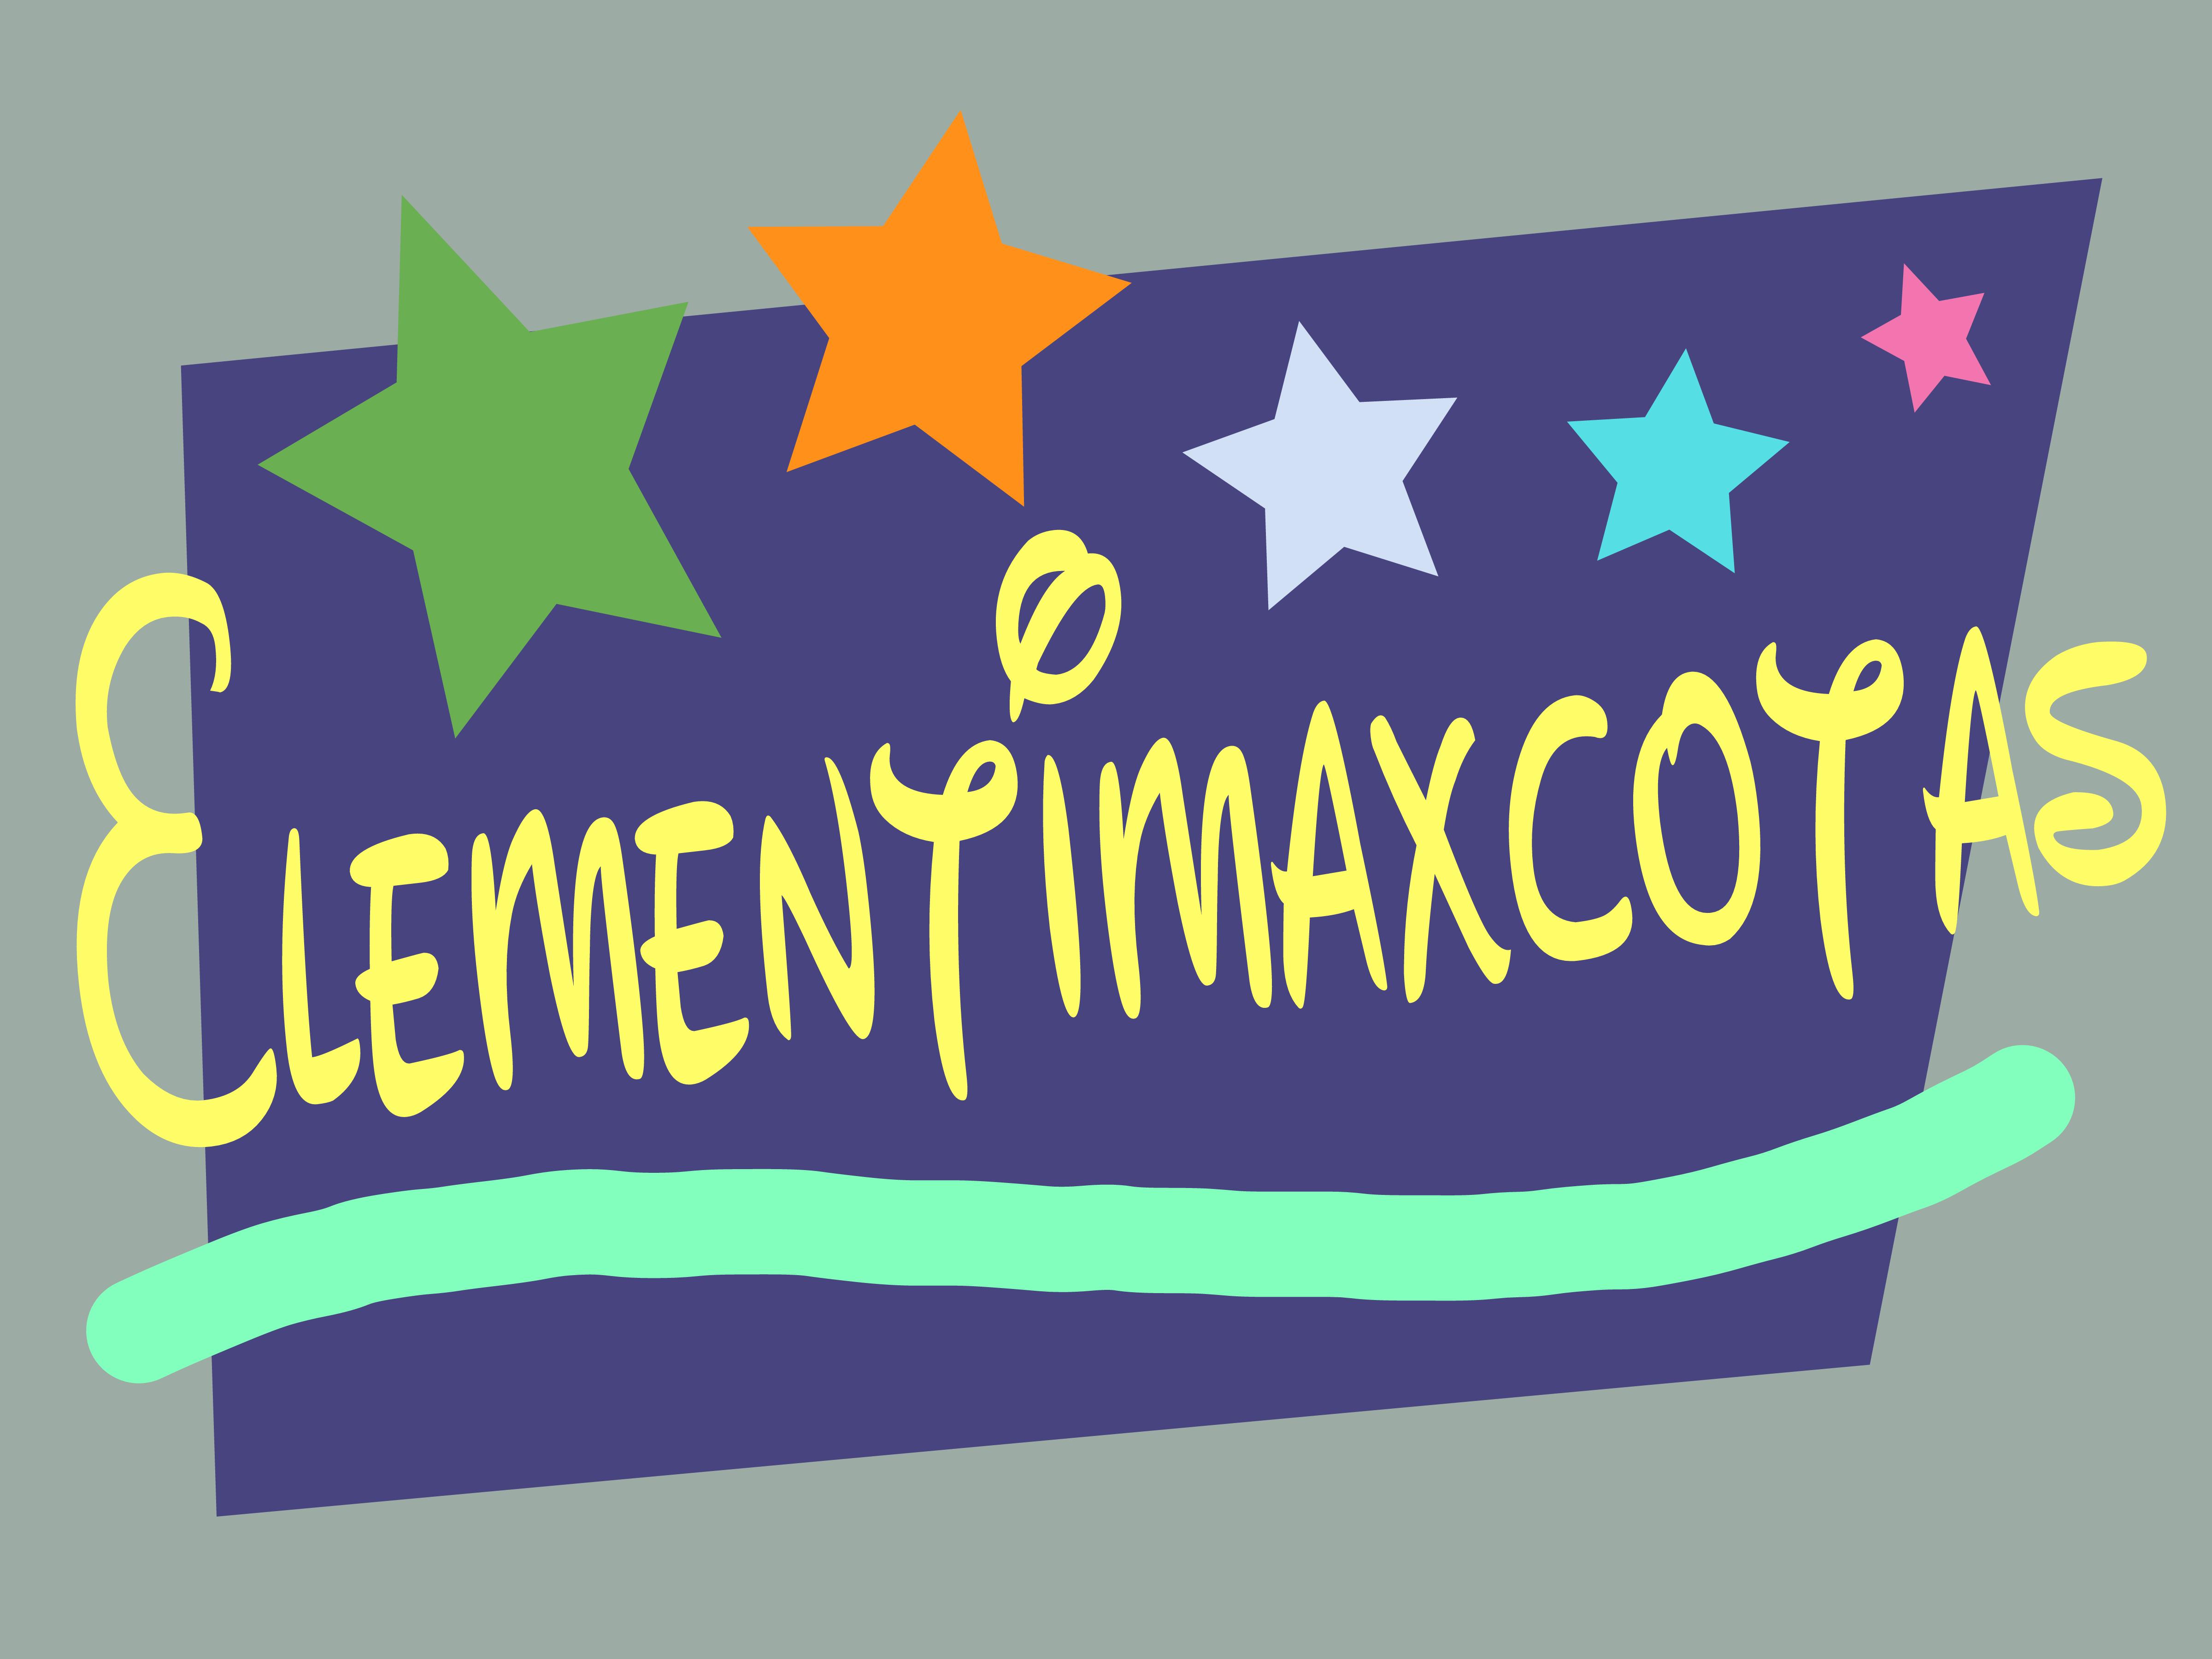 Elementimaxcotas